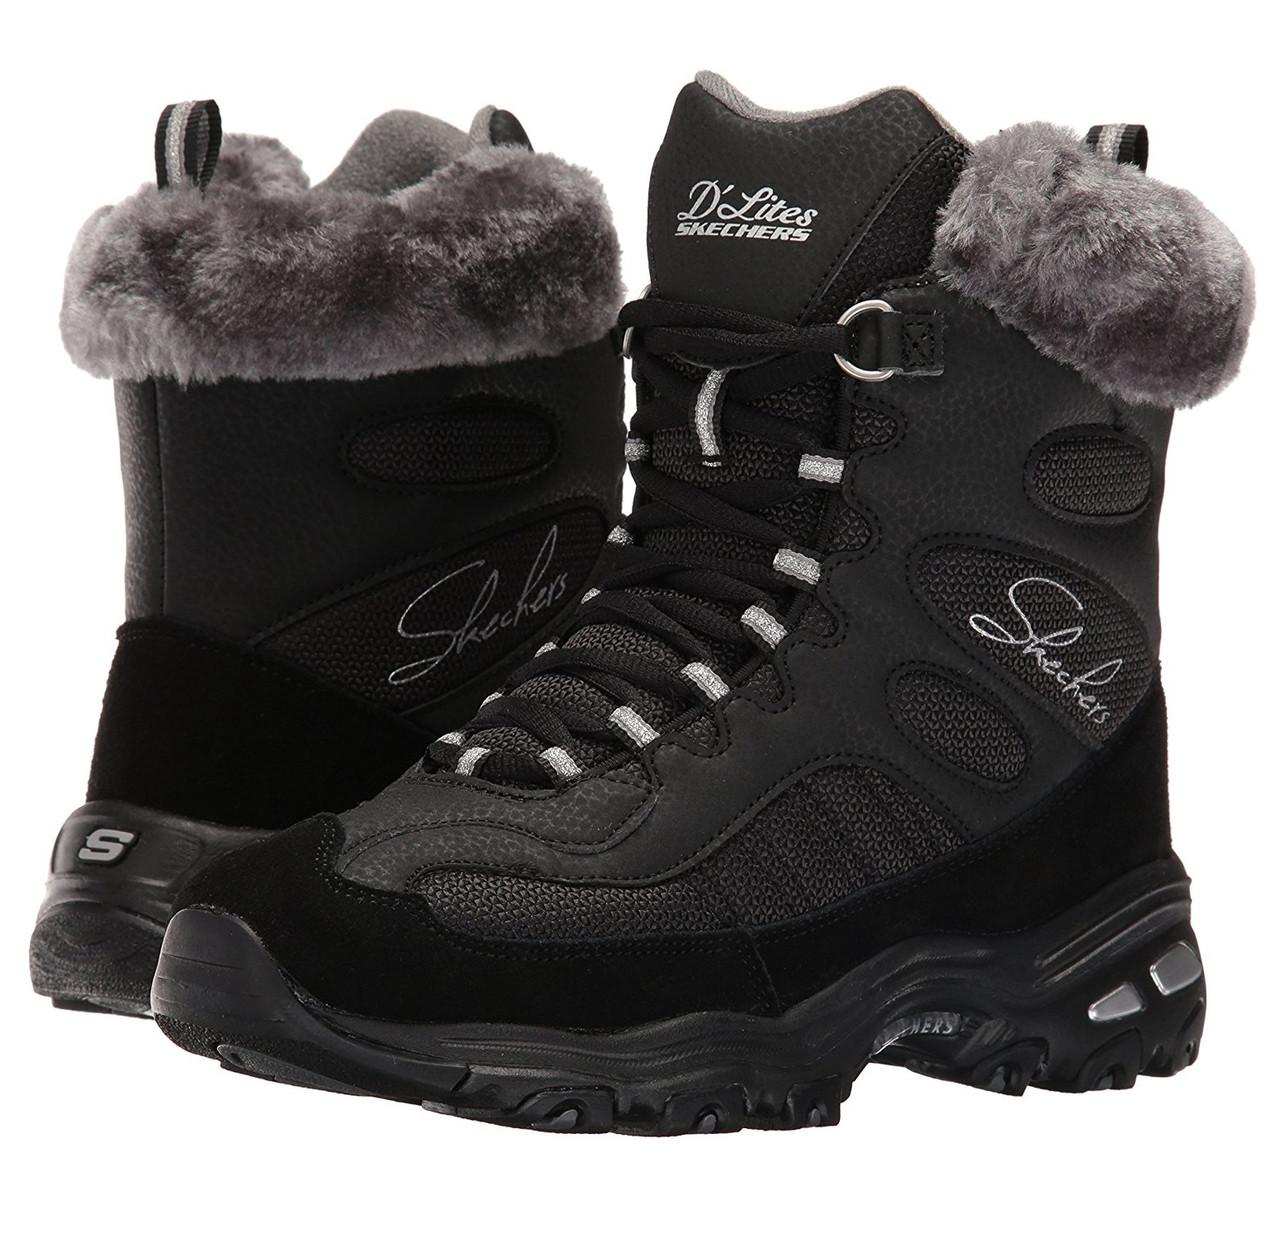 e647fd549 Ботинки зимние женские Skechers Women's D'Lites Chalet Lace Up Faux Fur  Collar Winter Boot